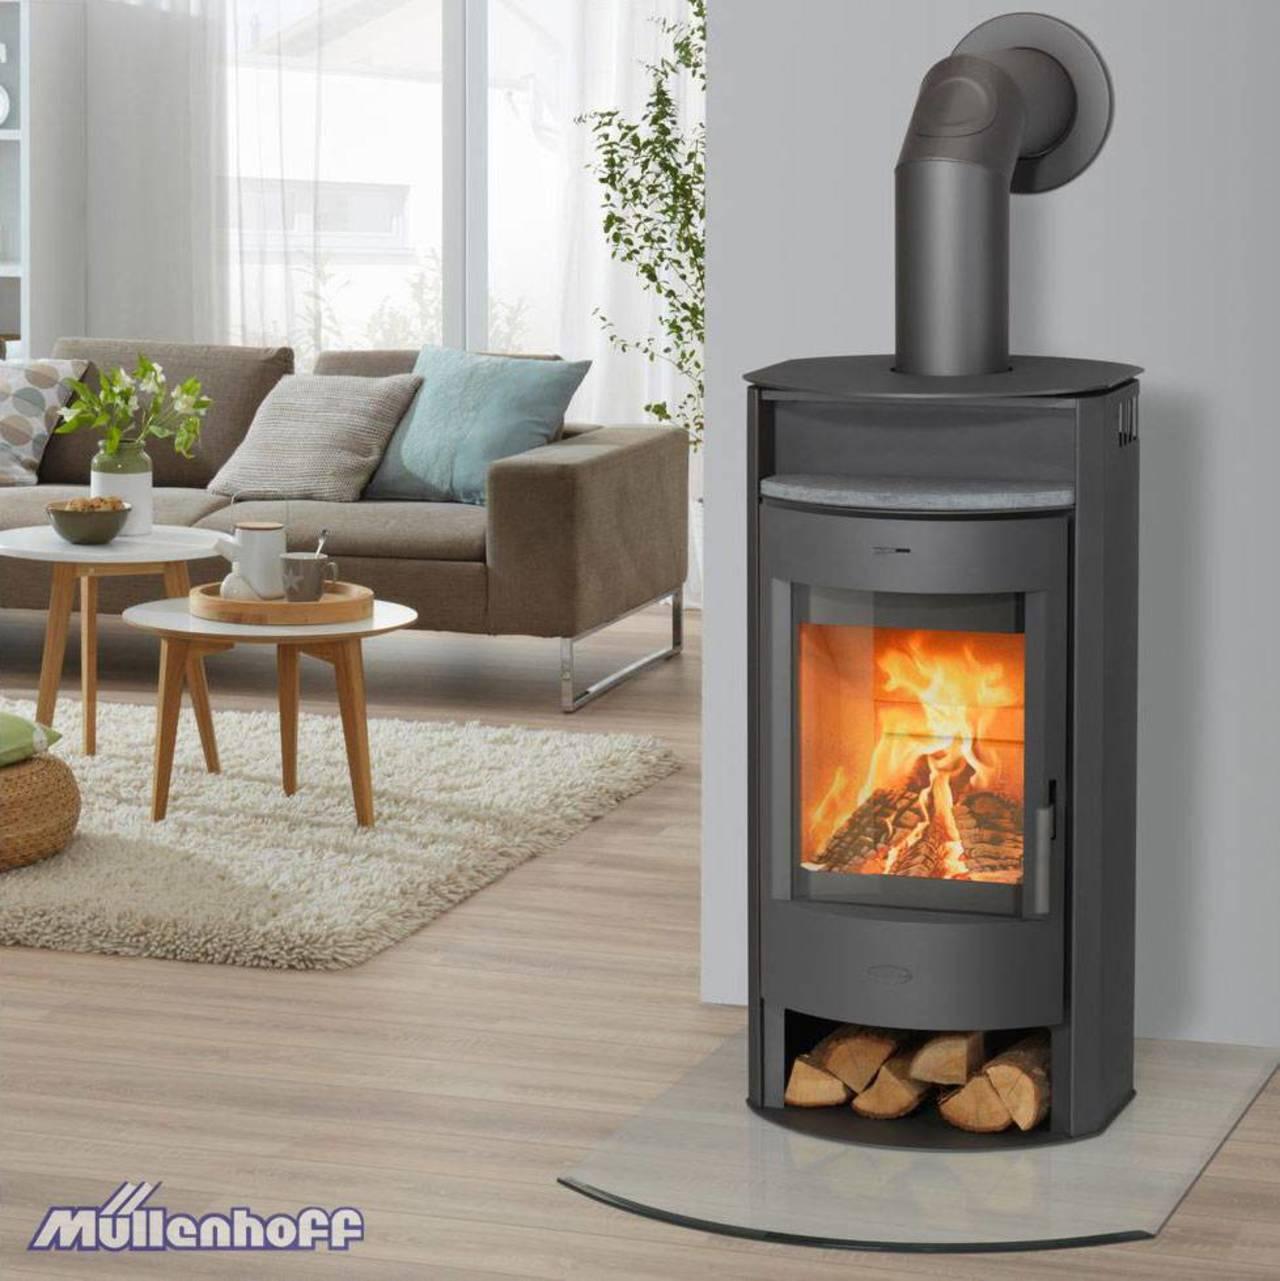 fireplace kaminofen prag 6 kw panorama scheibe kamin ofen holz ebay. Black Bedroom Furniture Sets. Home Design Ideas